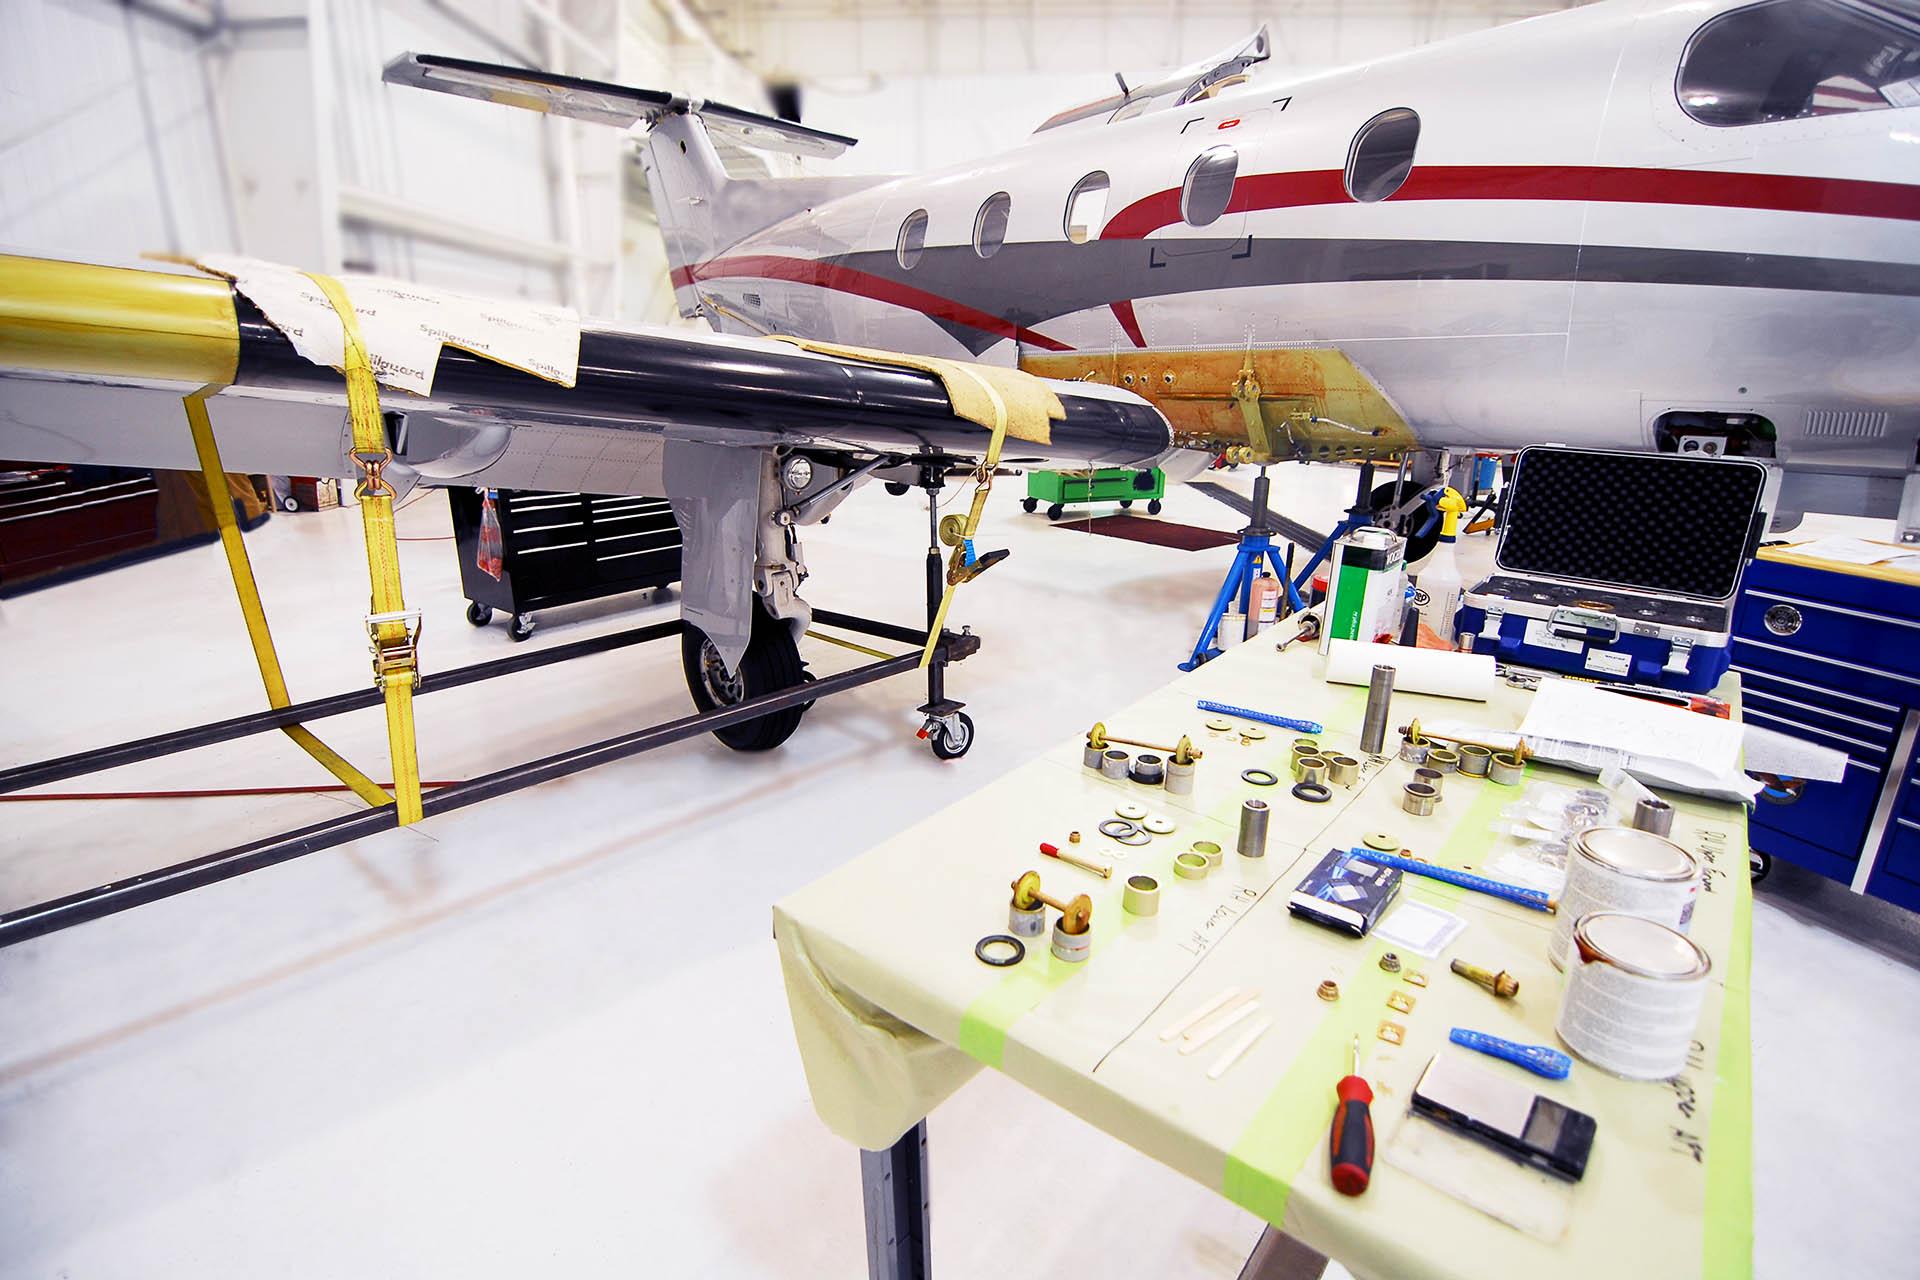 pc-12 pilatus service fargo jet center wing inspection